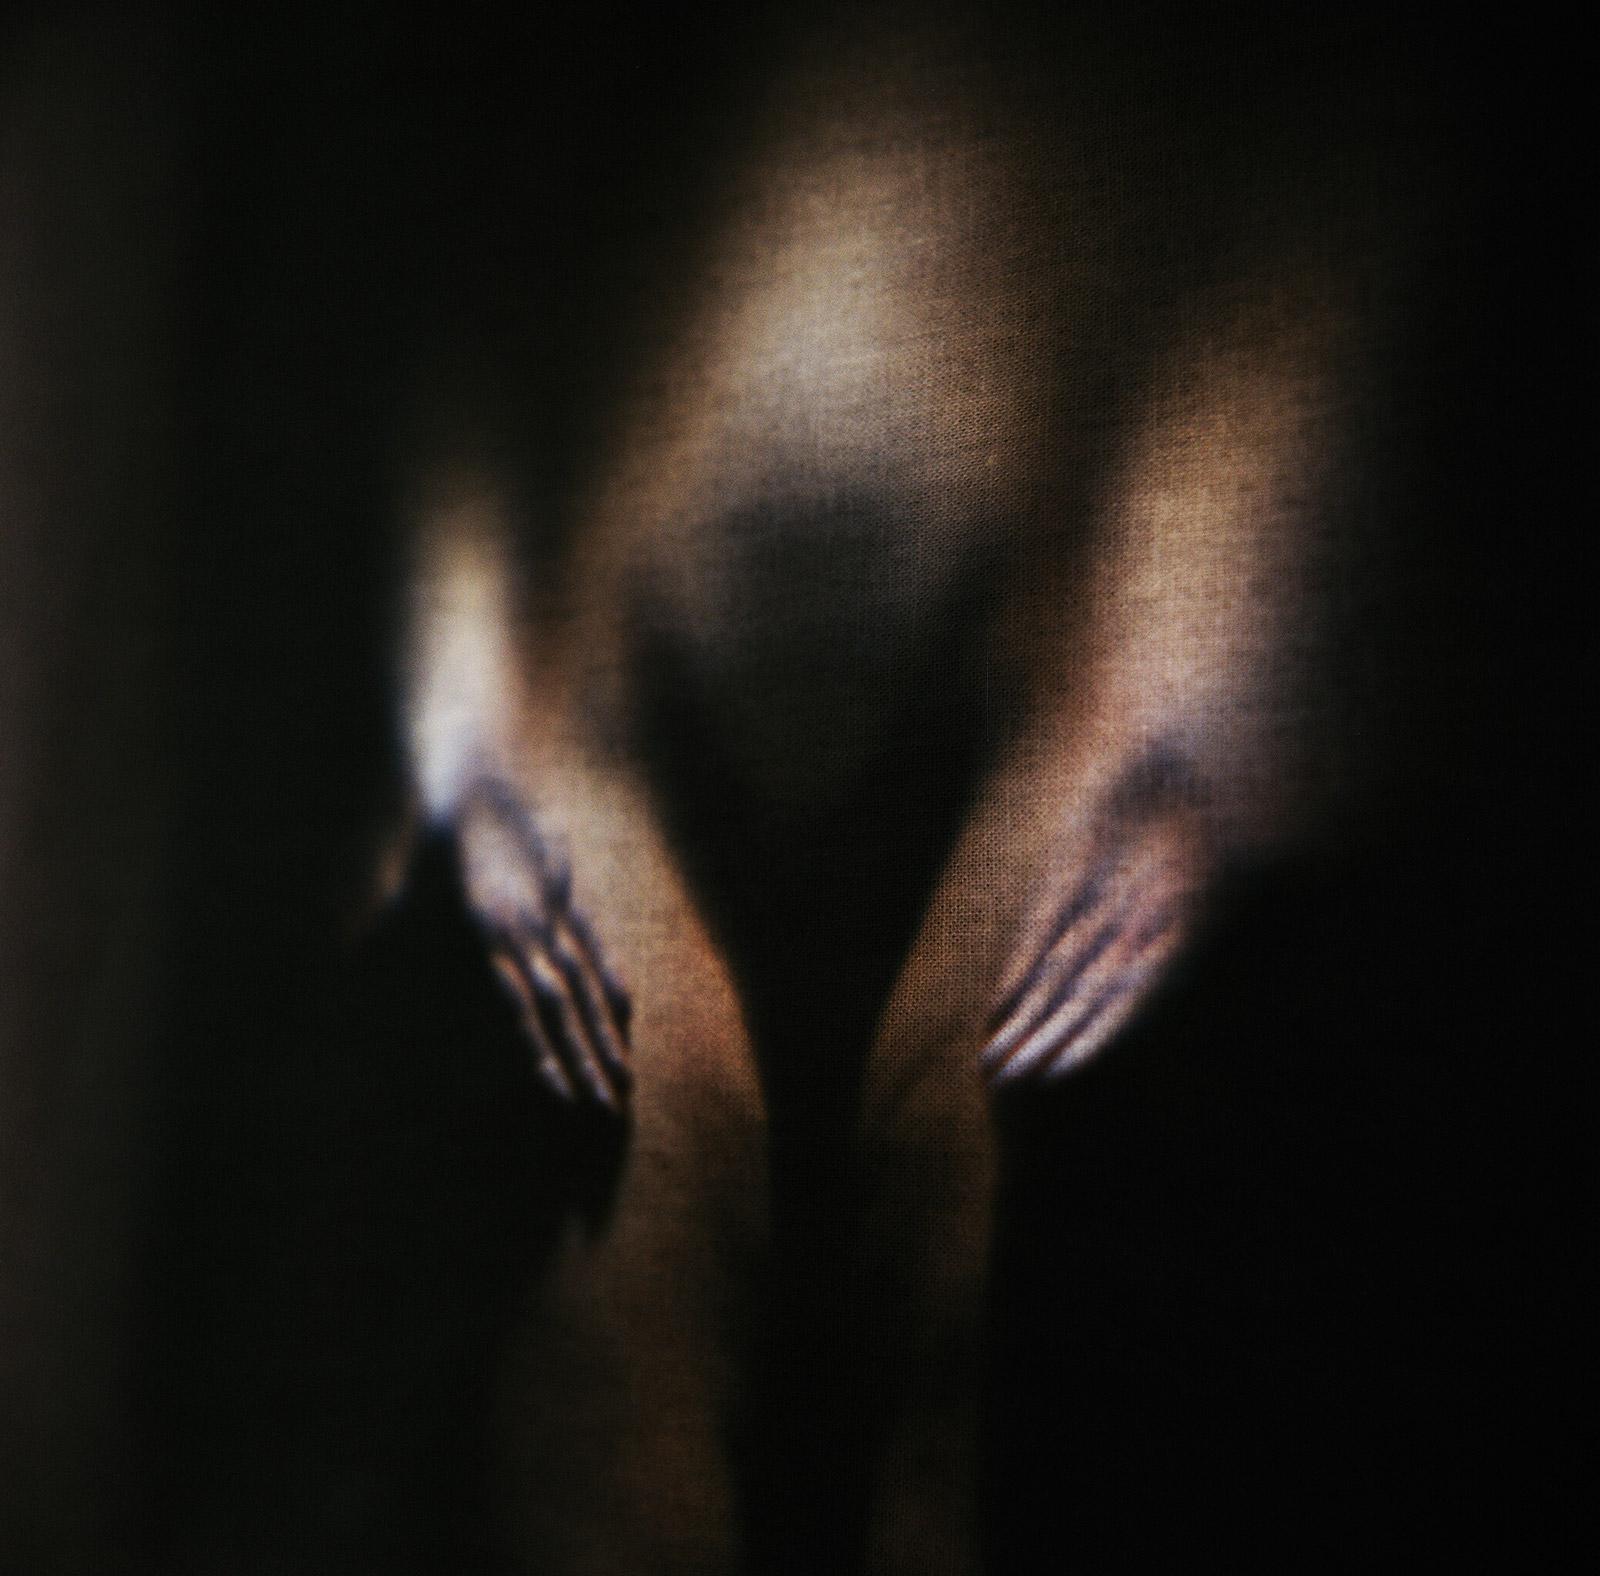 LA SEMILLA DE LA IMAGEN XV serie II. Fotografía analógica, 2009